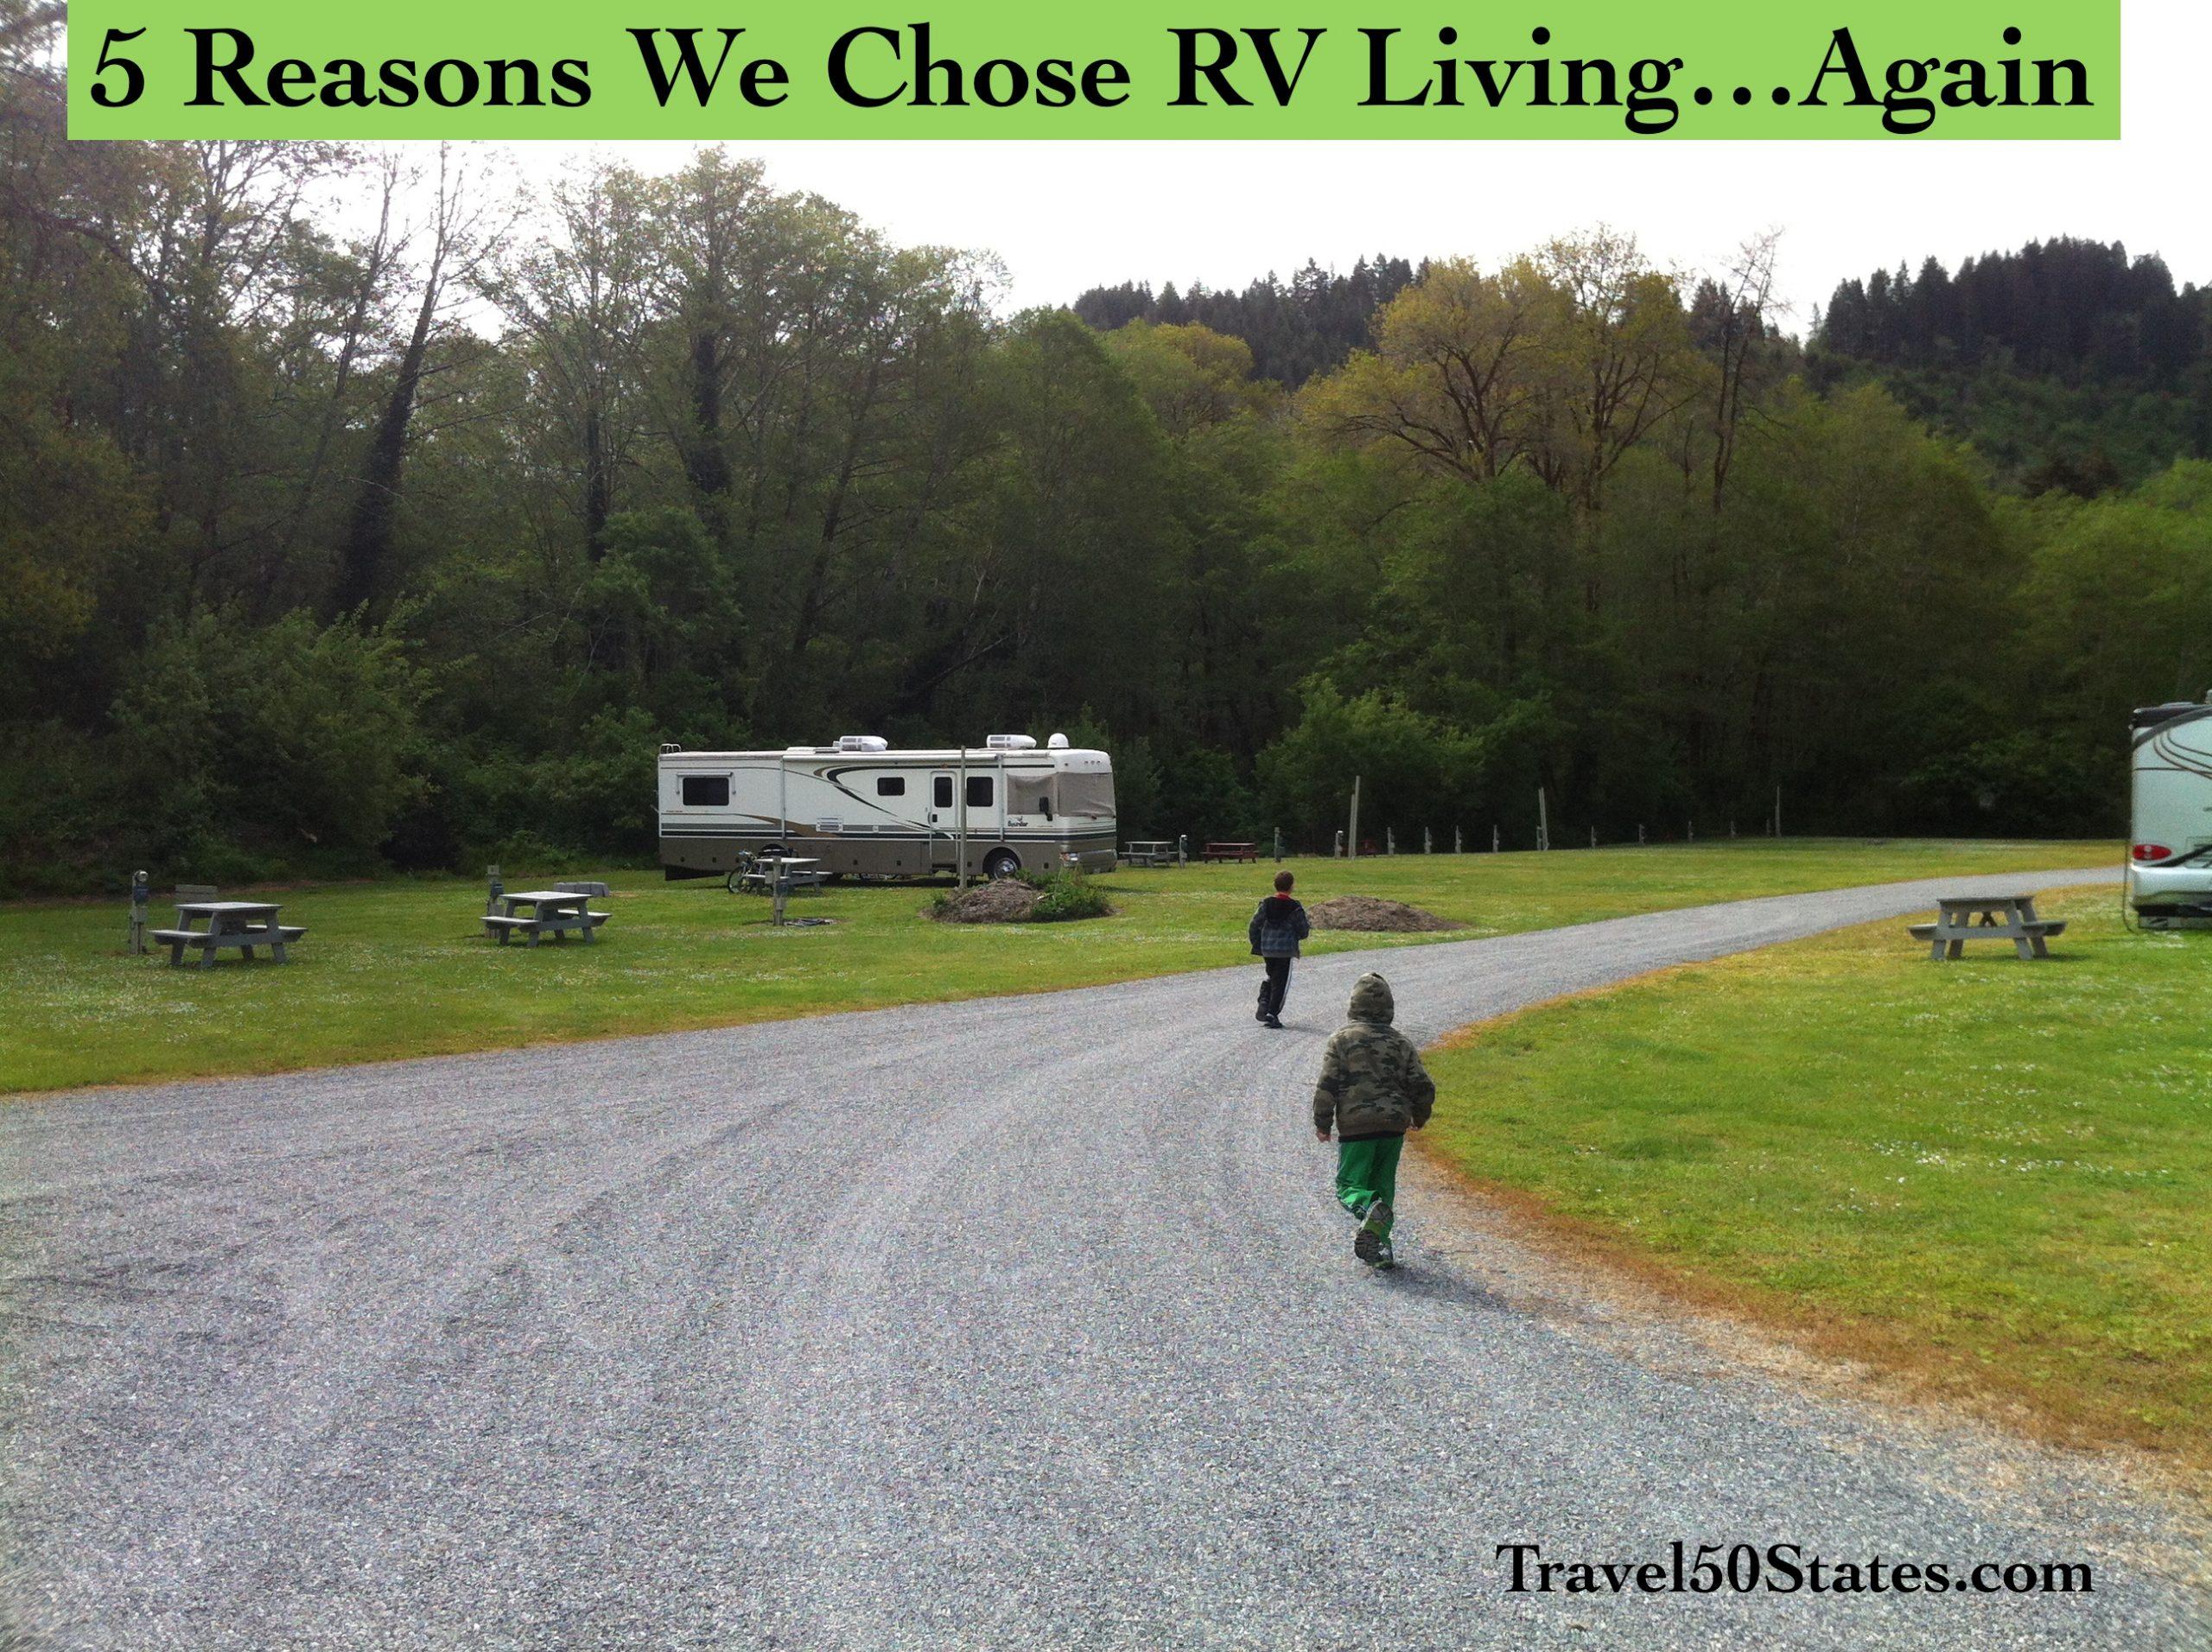 5 Reasons We Chose RV Living…Again